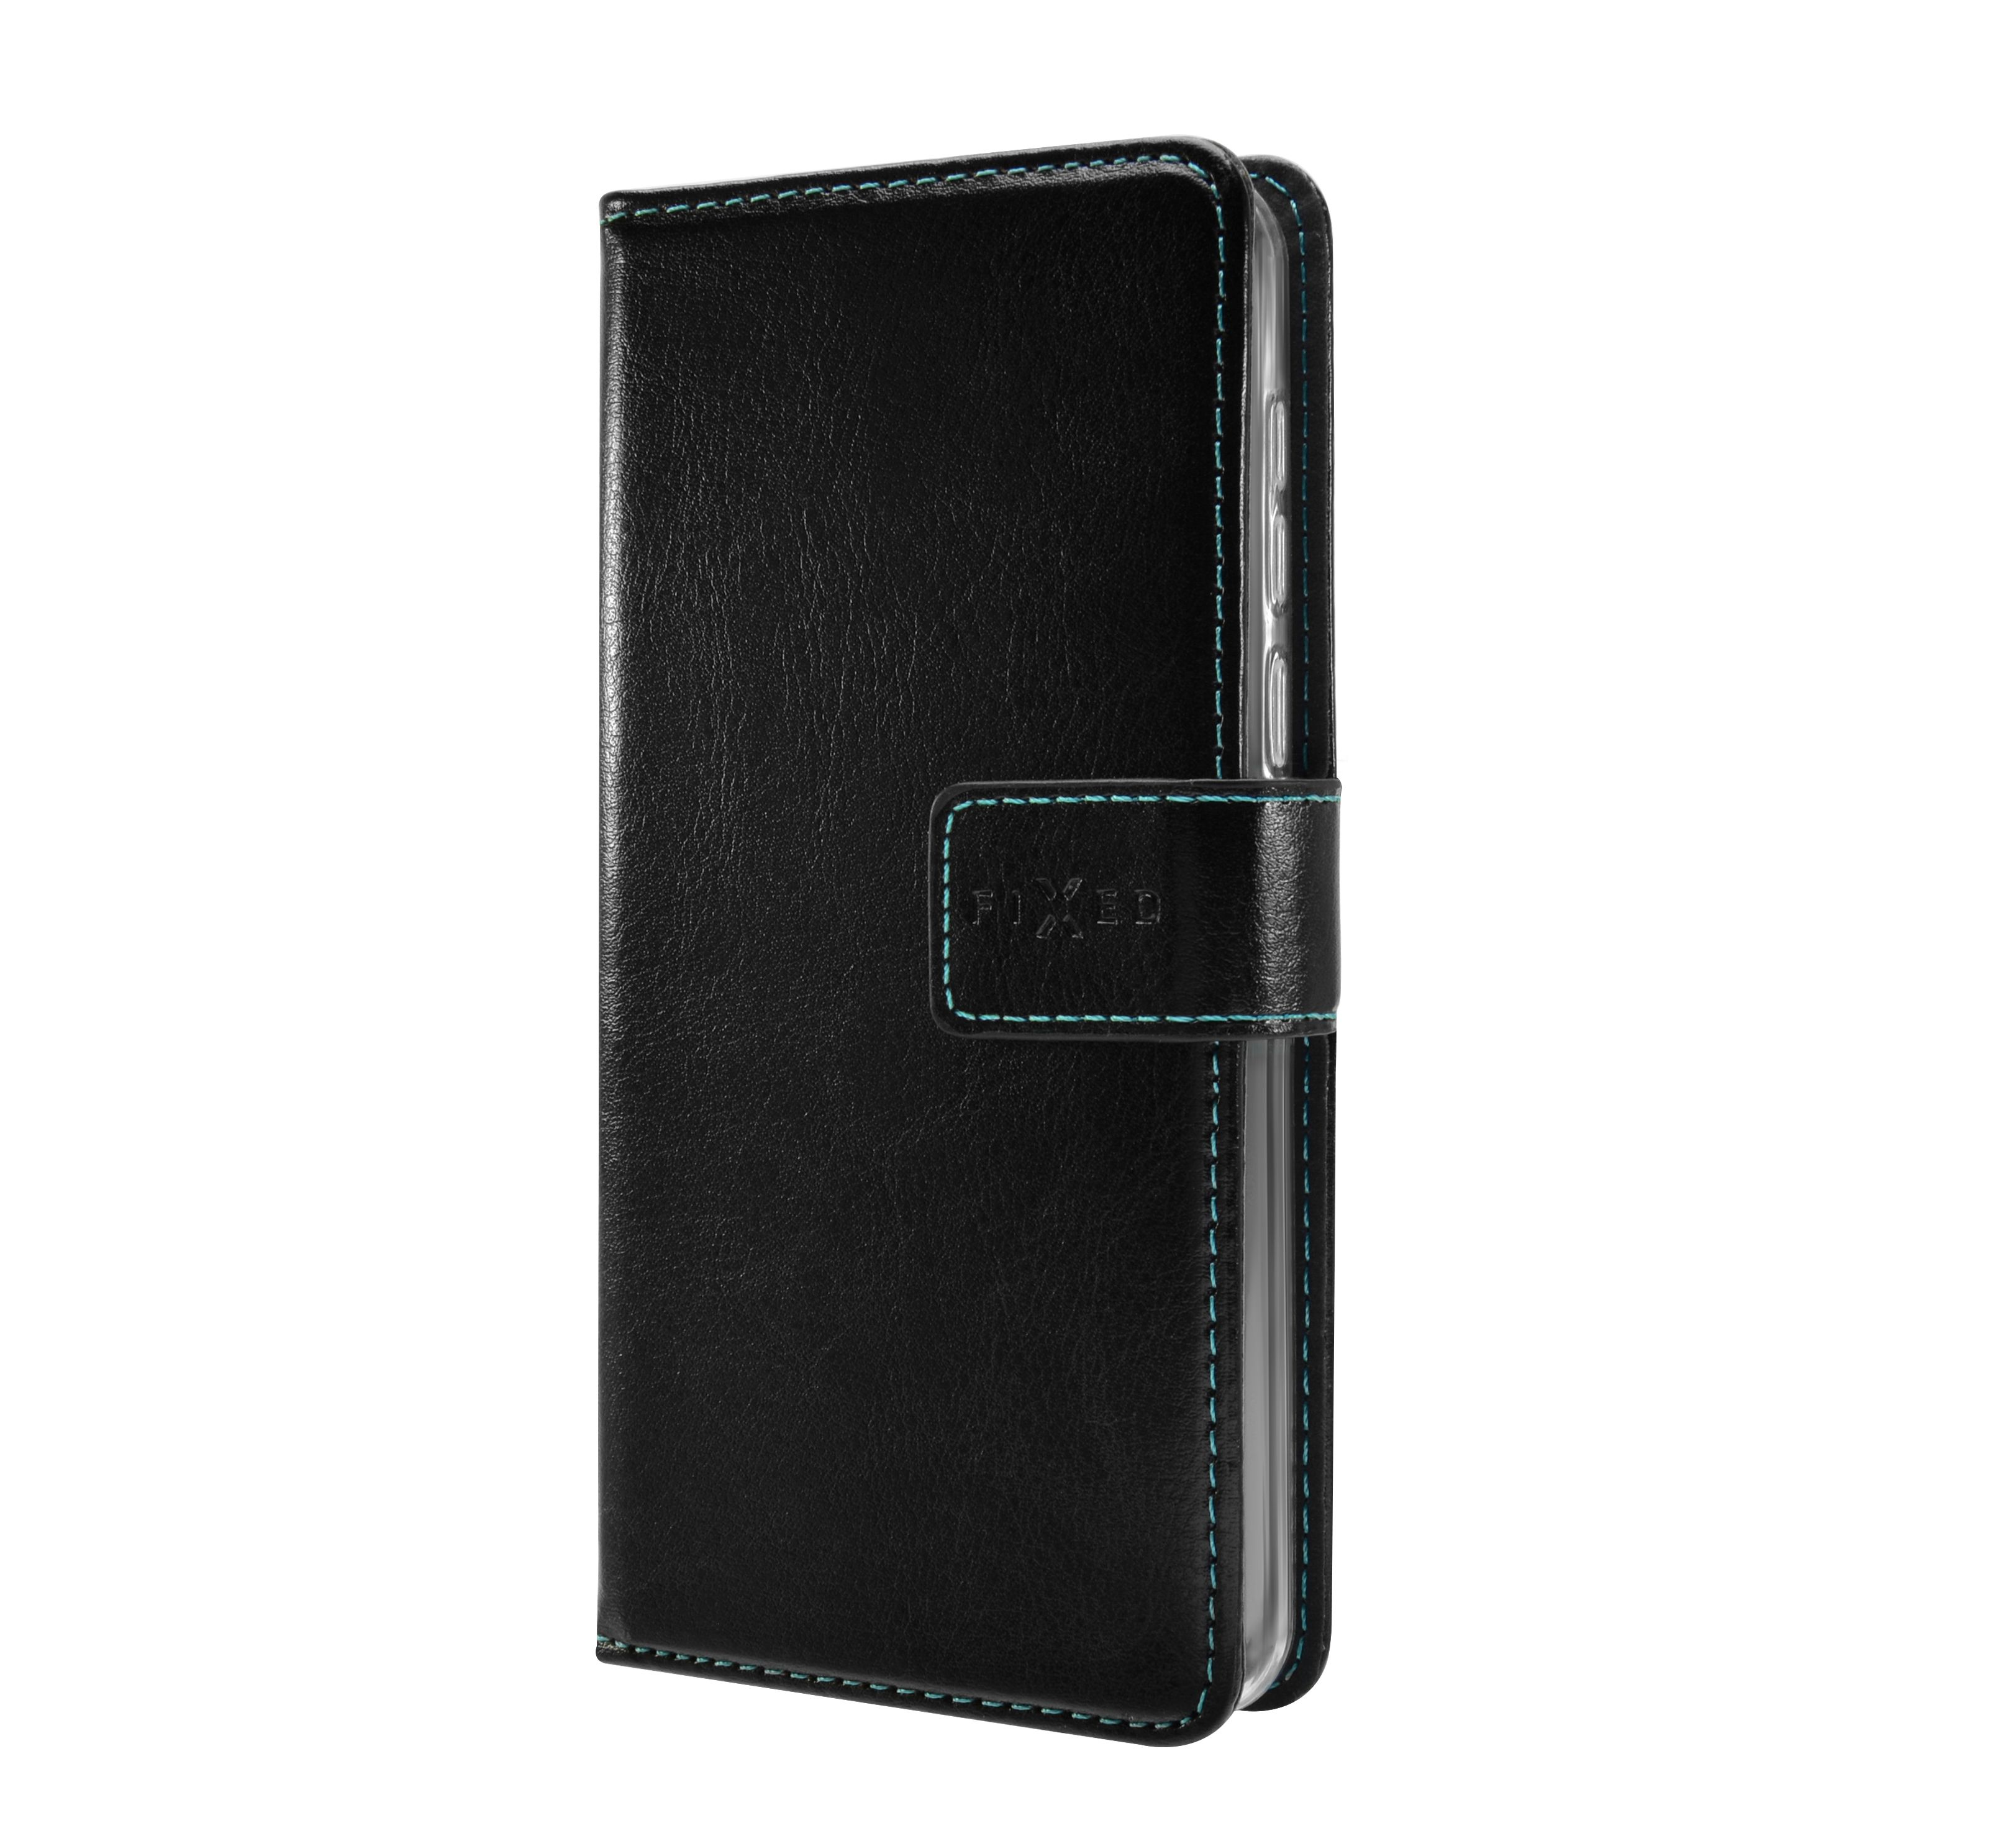 Pouzdro typu kniha FIXED Opus pro Huawei Y5 (2018), černé